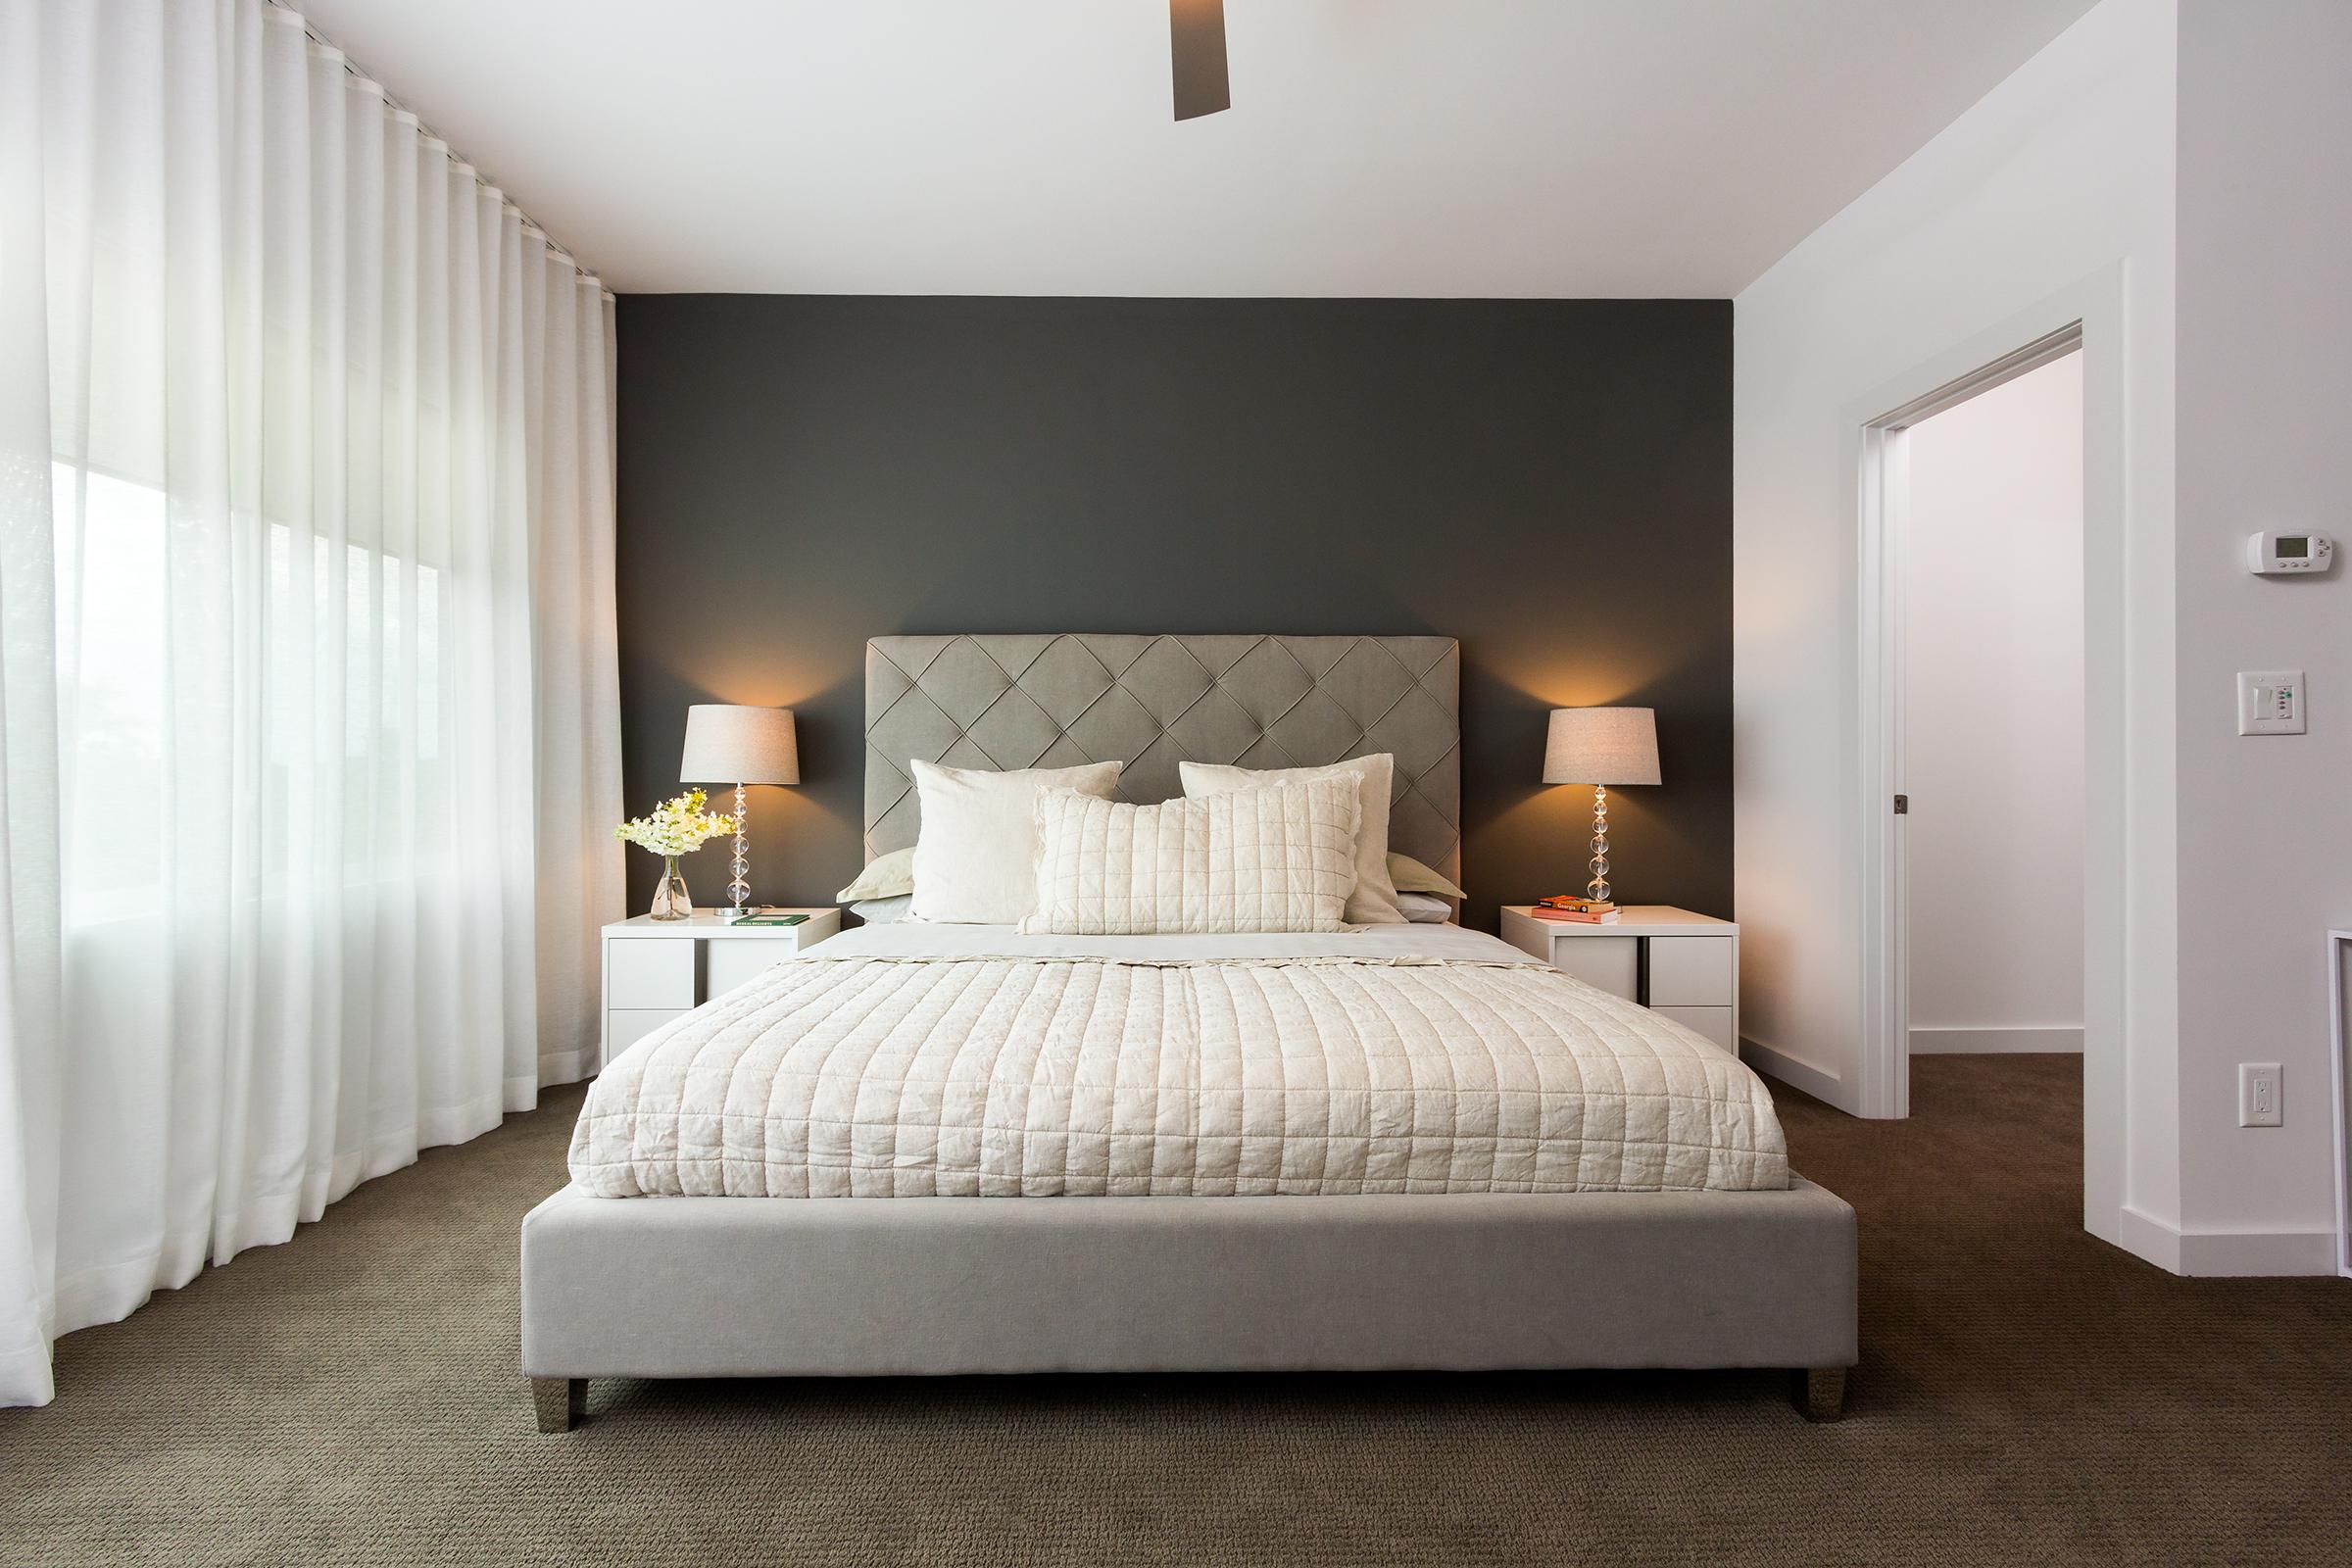 031 1307 Axis_Master Bedroom 3.jpg